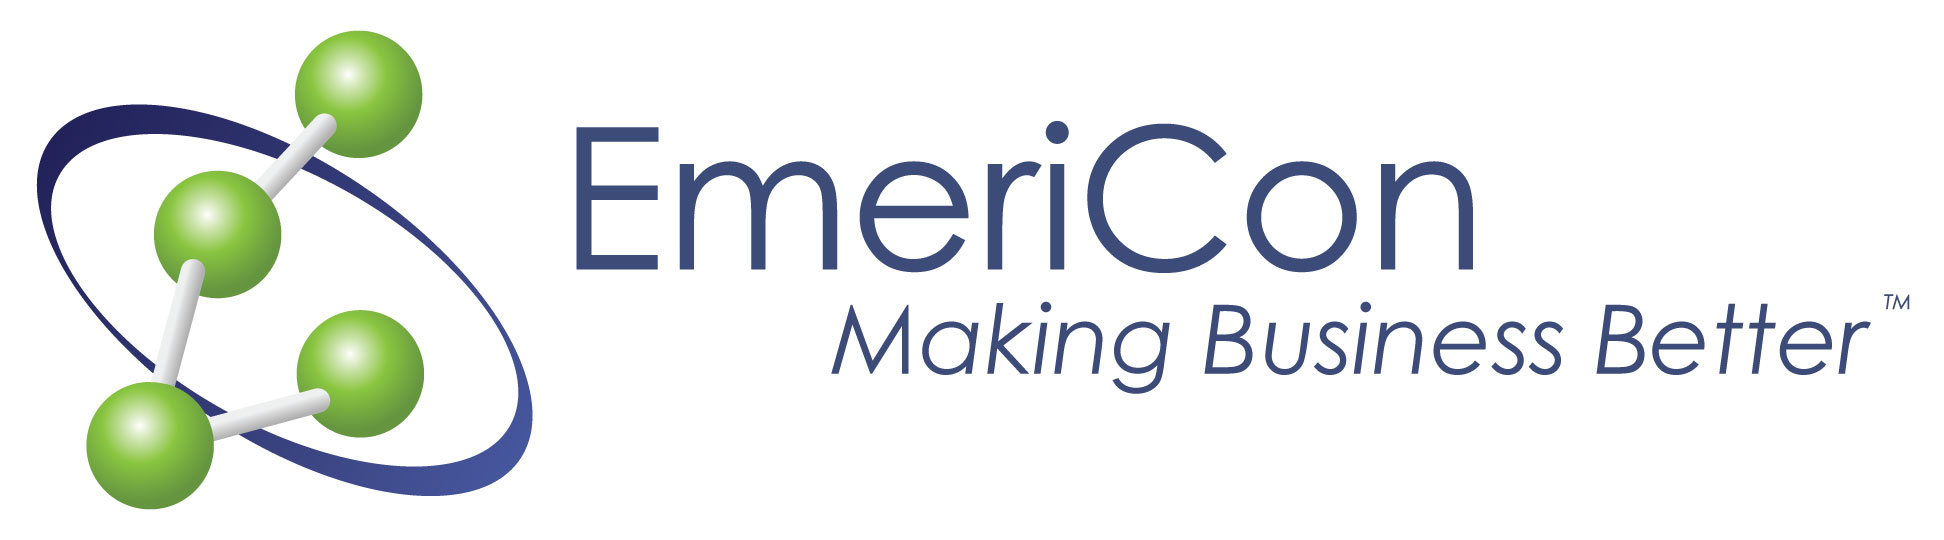 EmeriCon Logo New Tagline Flat